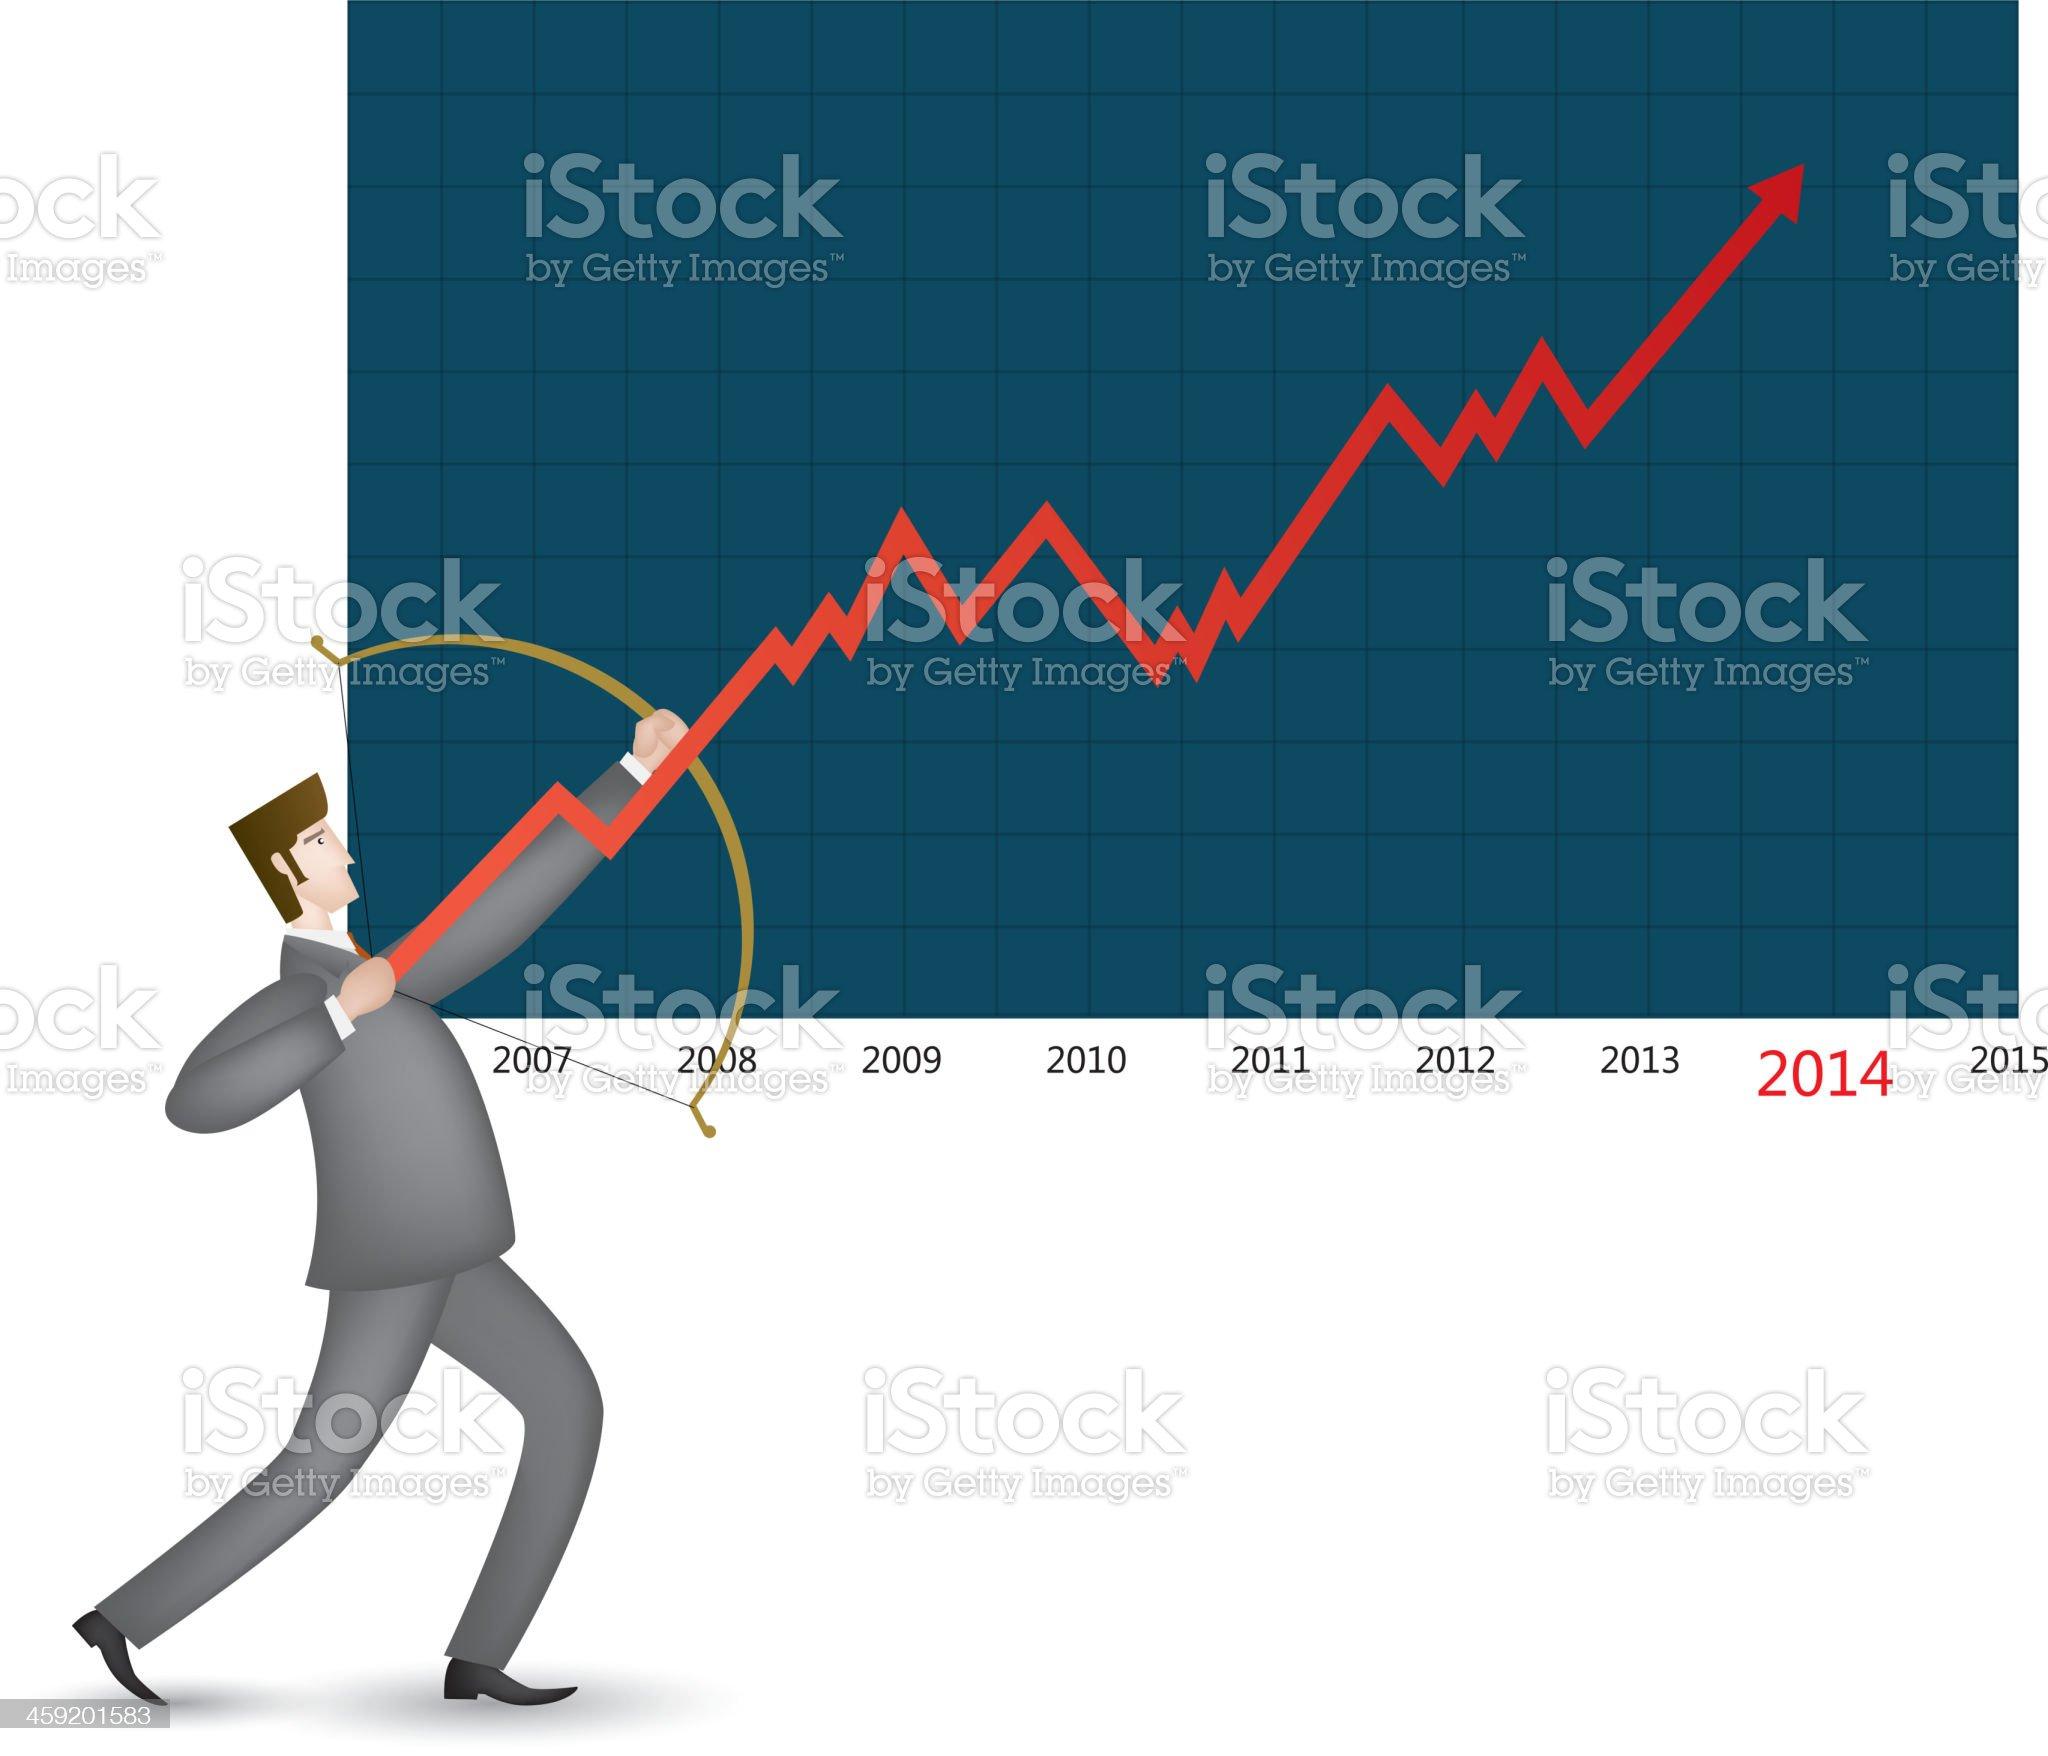 Shooting a growth arrow royalty-free stock vector art